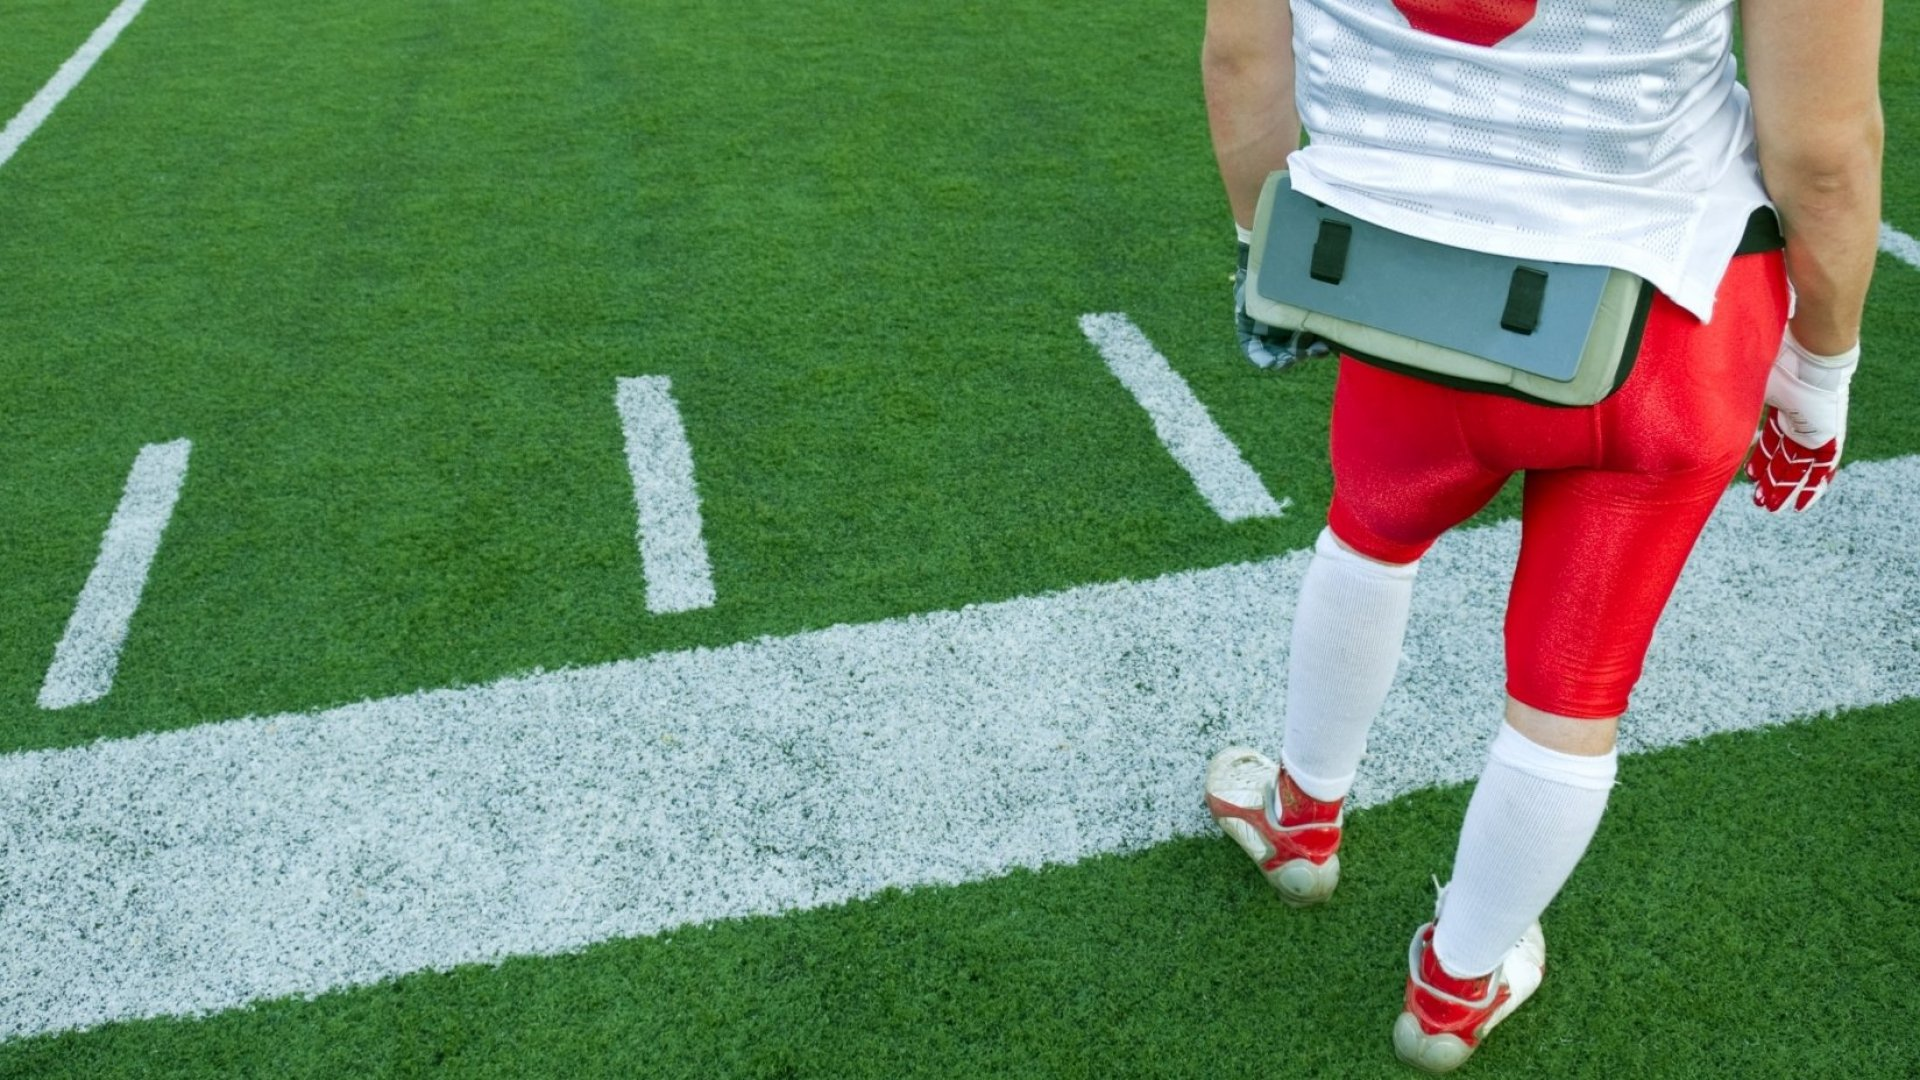 Multibillion-Dollar Sports Market, Still Waiting on the Sidelines